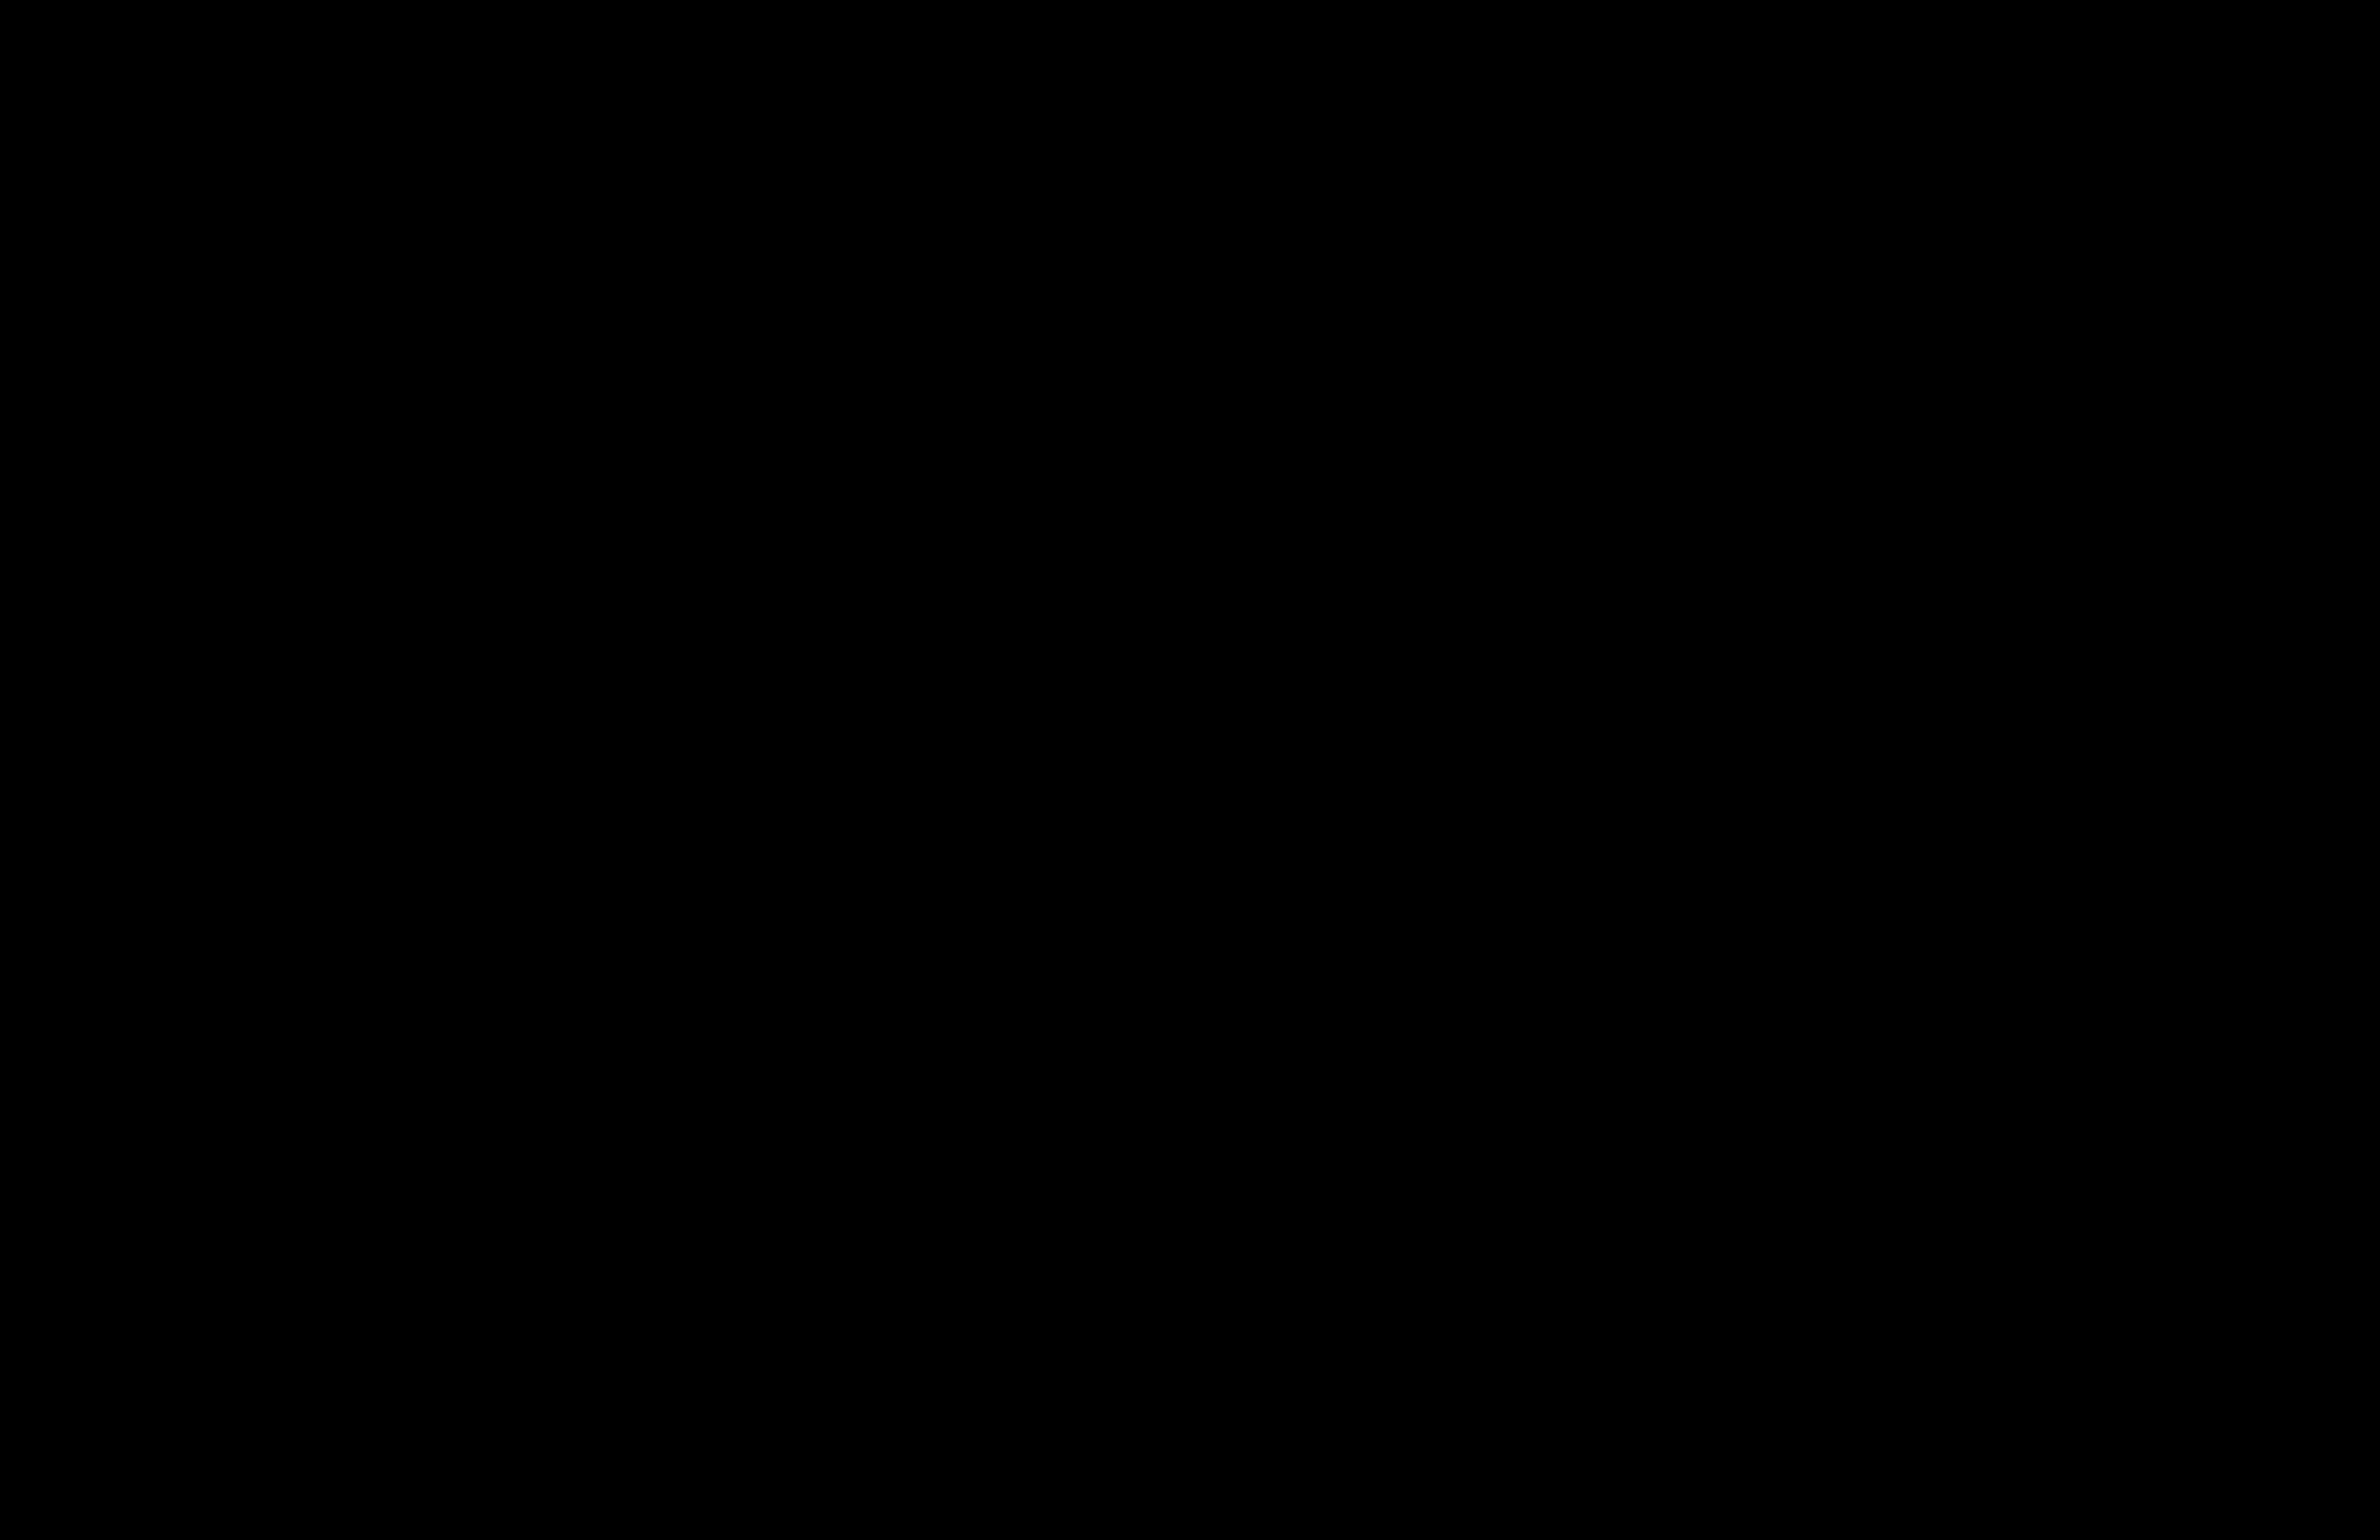 tr2273-2